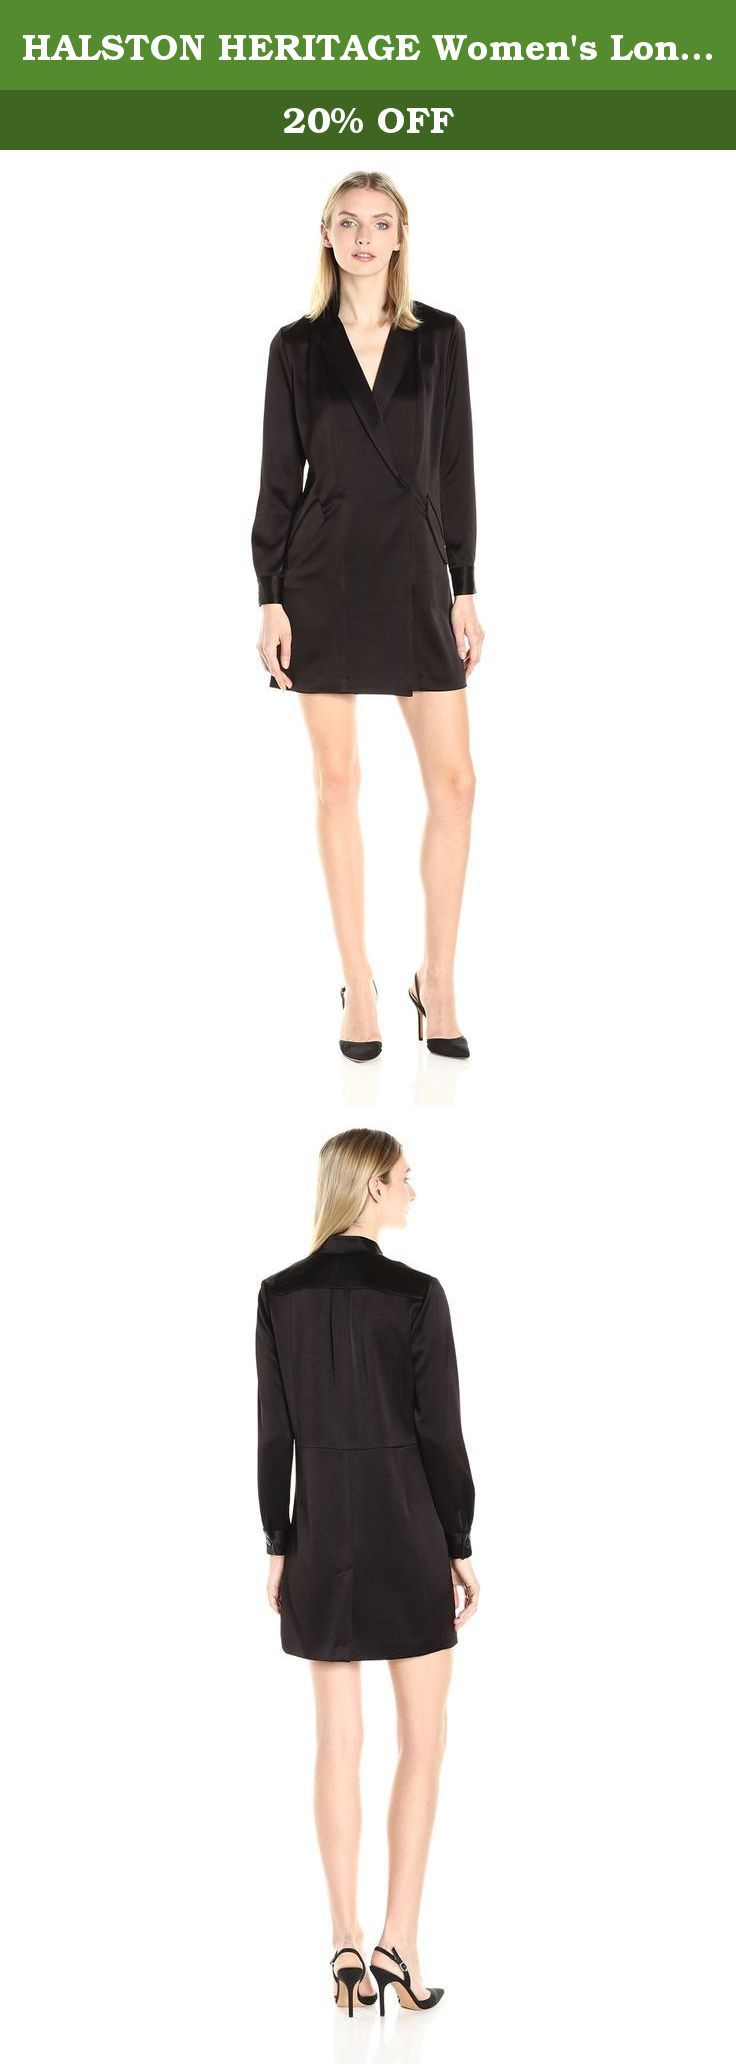 HALSTON HERITAGE Women's Long Sleeve Satin Shirt Dress, Black, 10. Luxe tuxedo long sleeve shift shirtdress in satin with lapels like jacket.